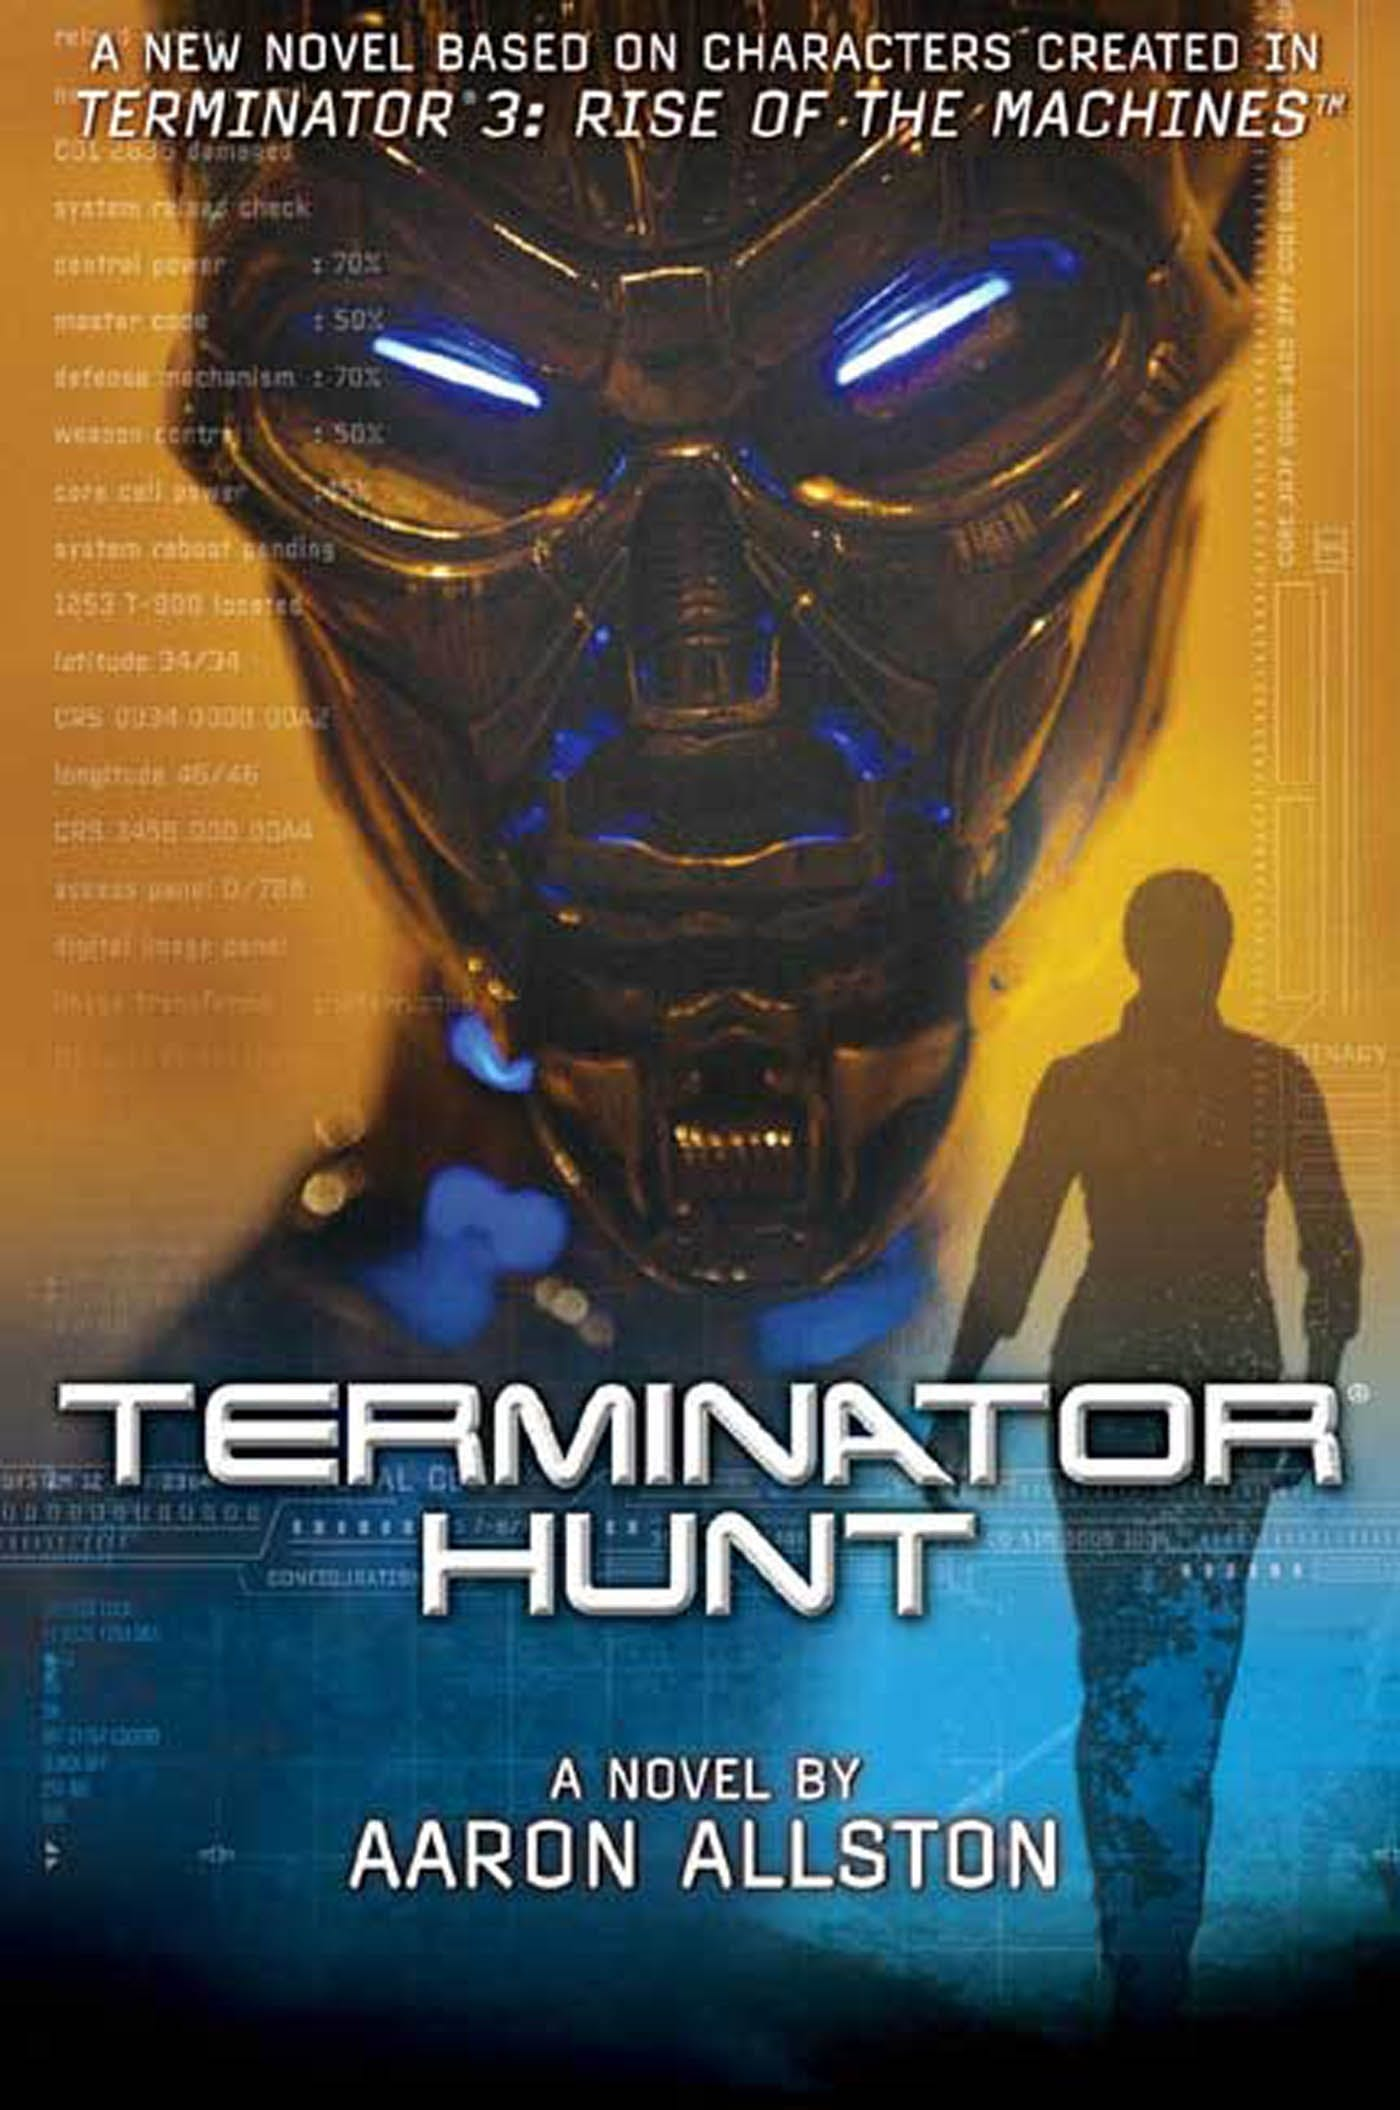 Image of Terminator 3: Terminator Hunt